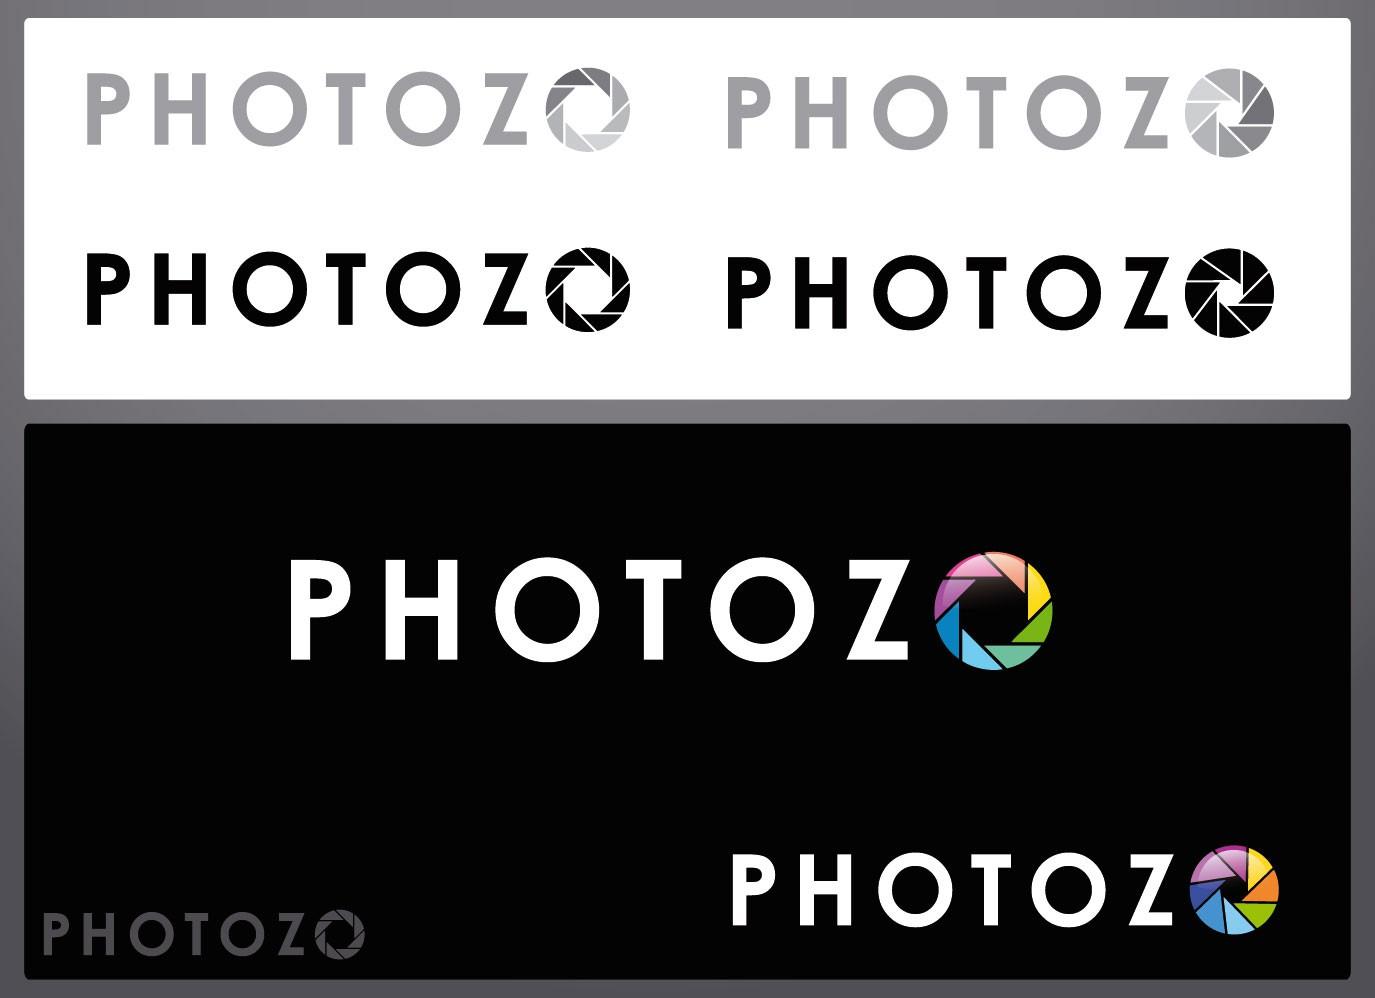 PHOTOZO needs a new logo